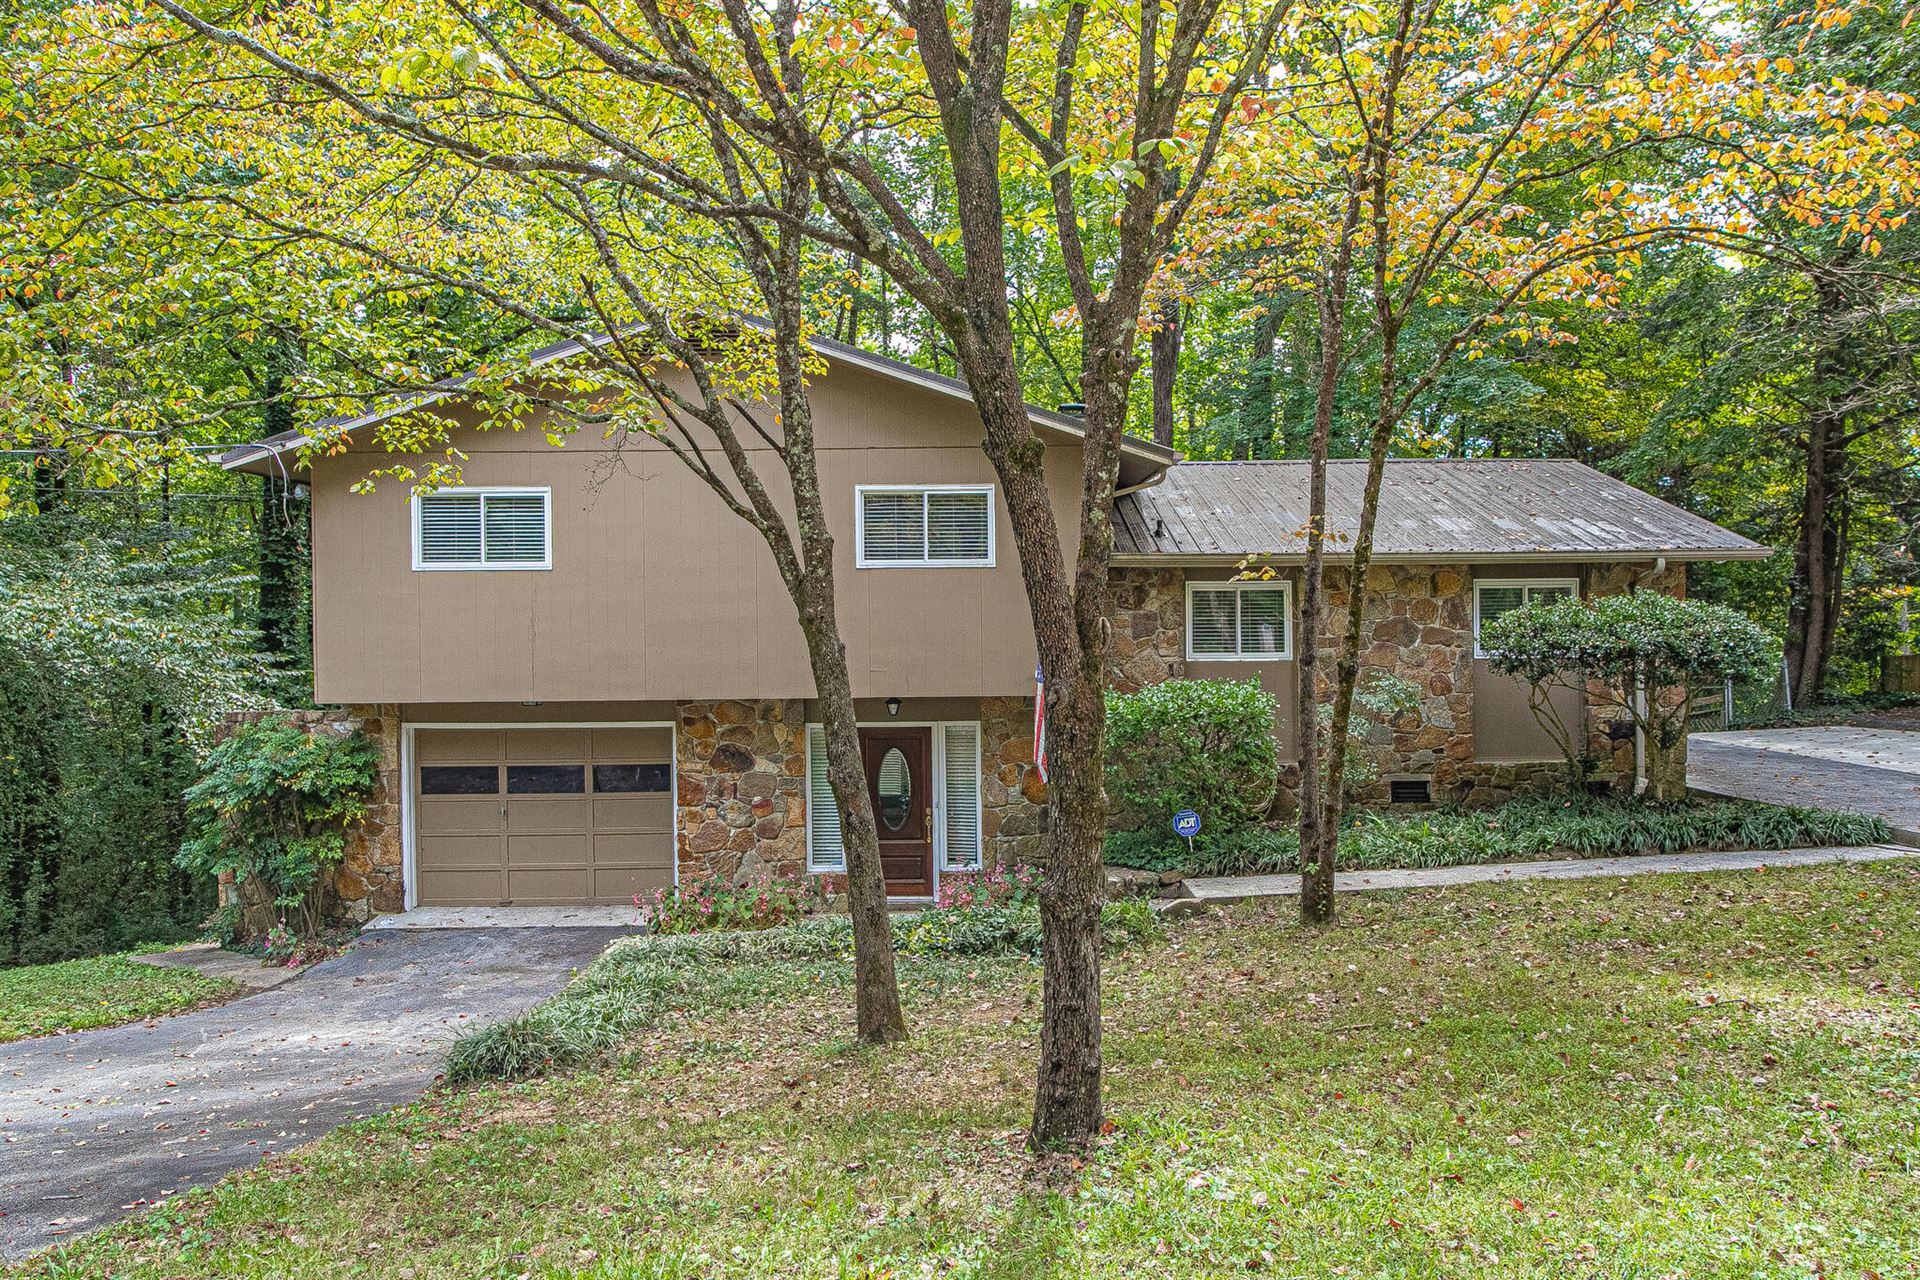 Photo of 977 W Outer Drive, Oak Ridge, TN 37830 (MLS # 1167859)